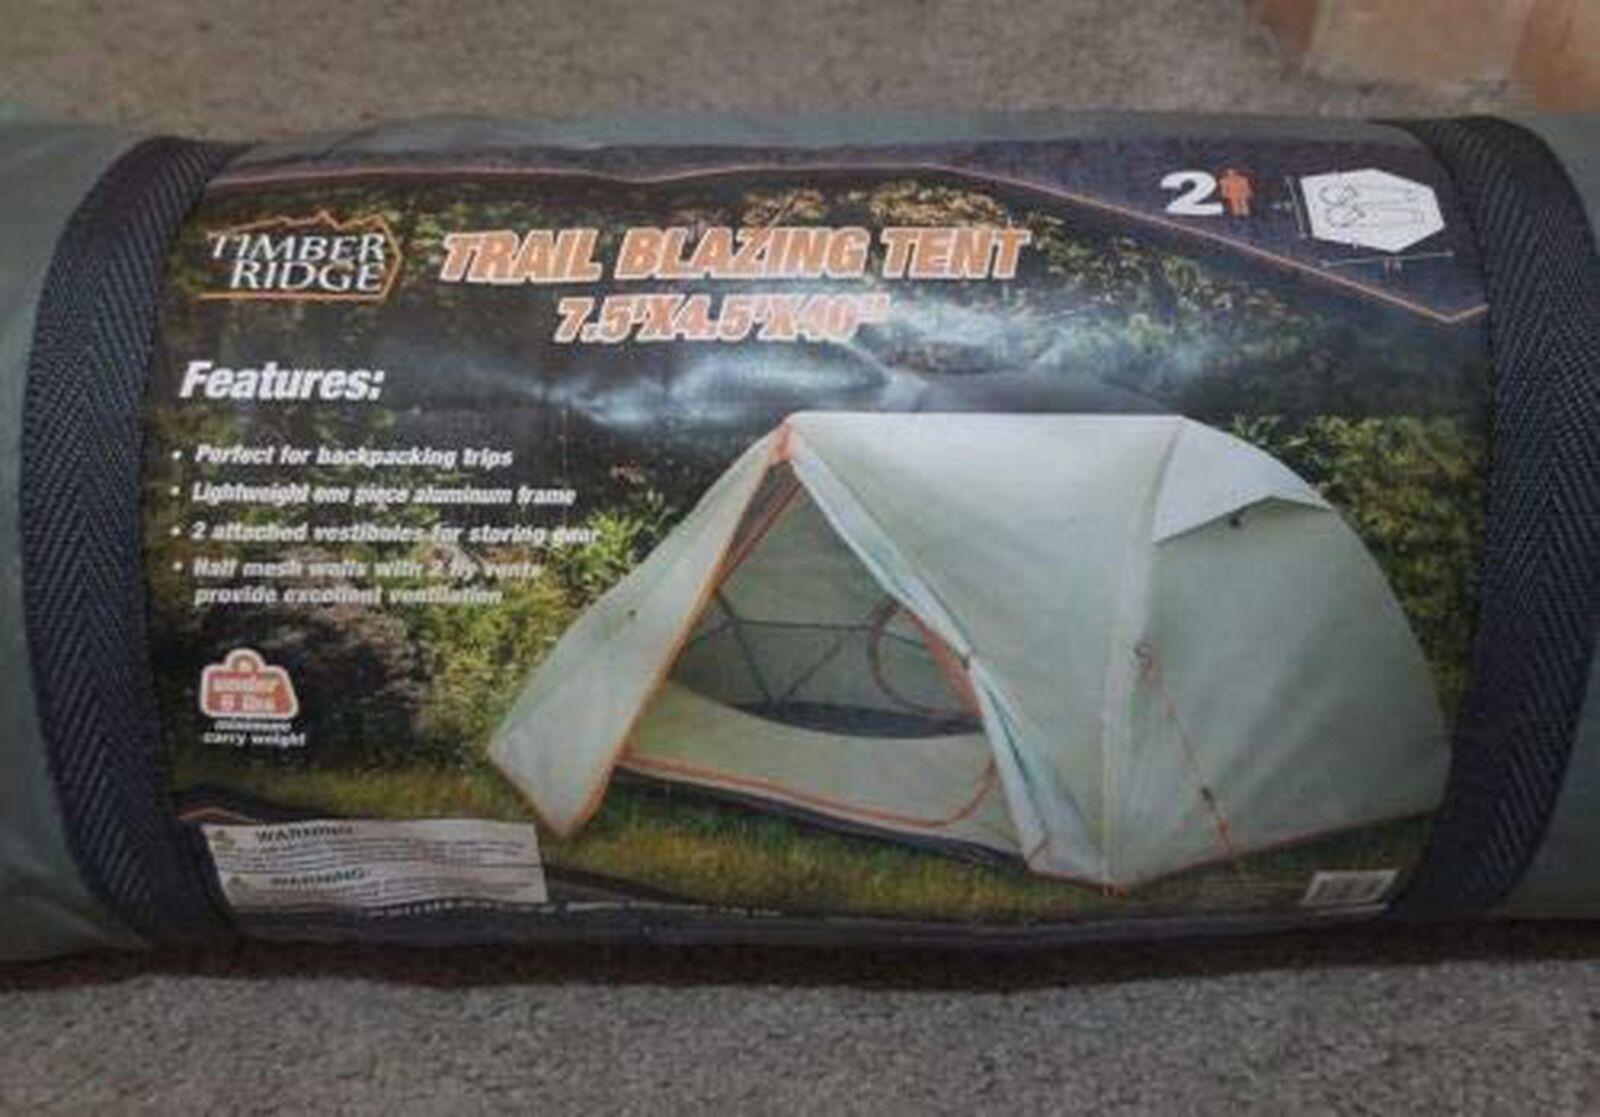 Timber Ridge Trail Blazing Tent 2 People